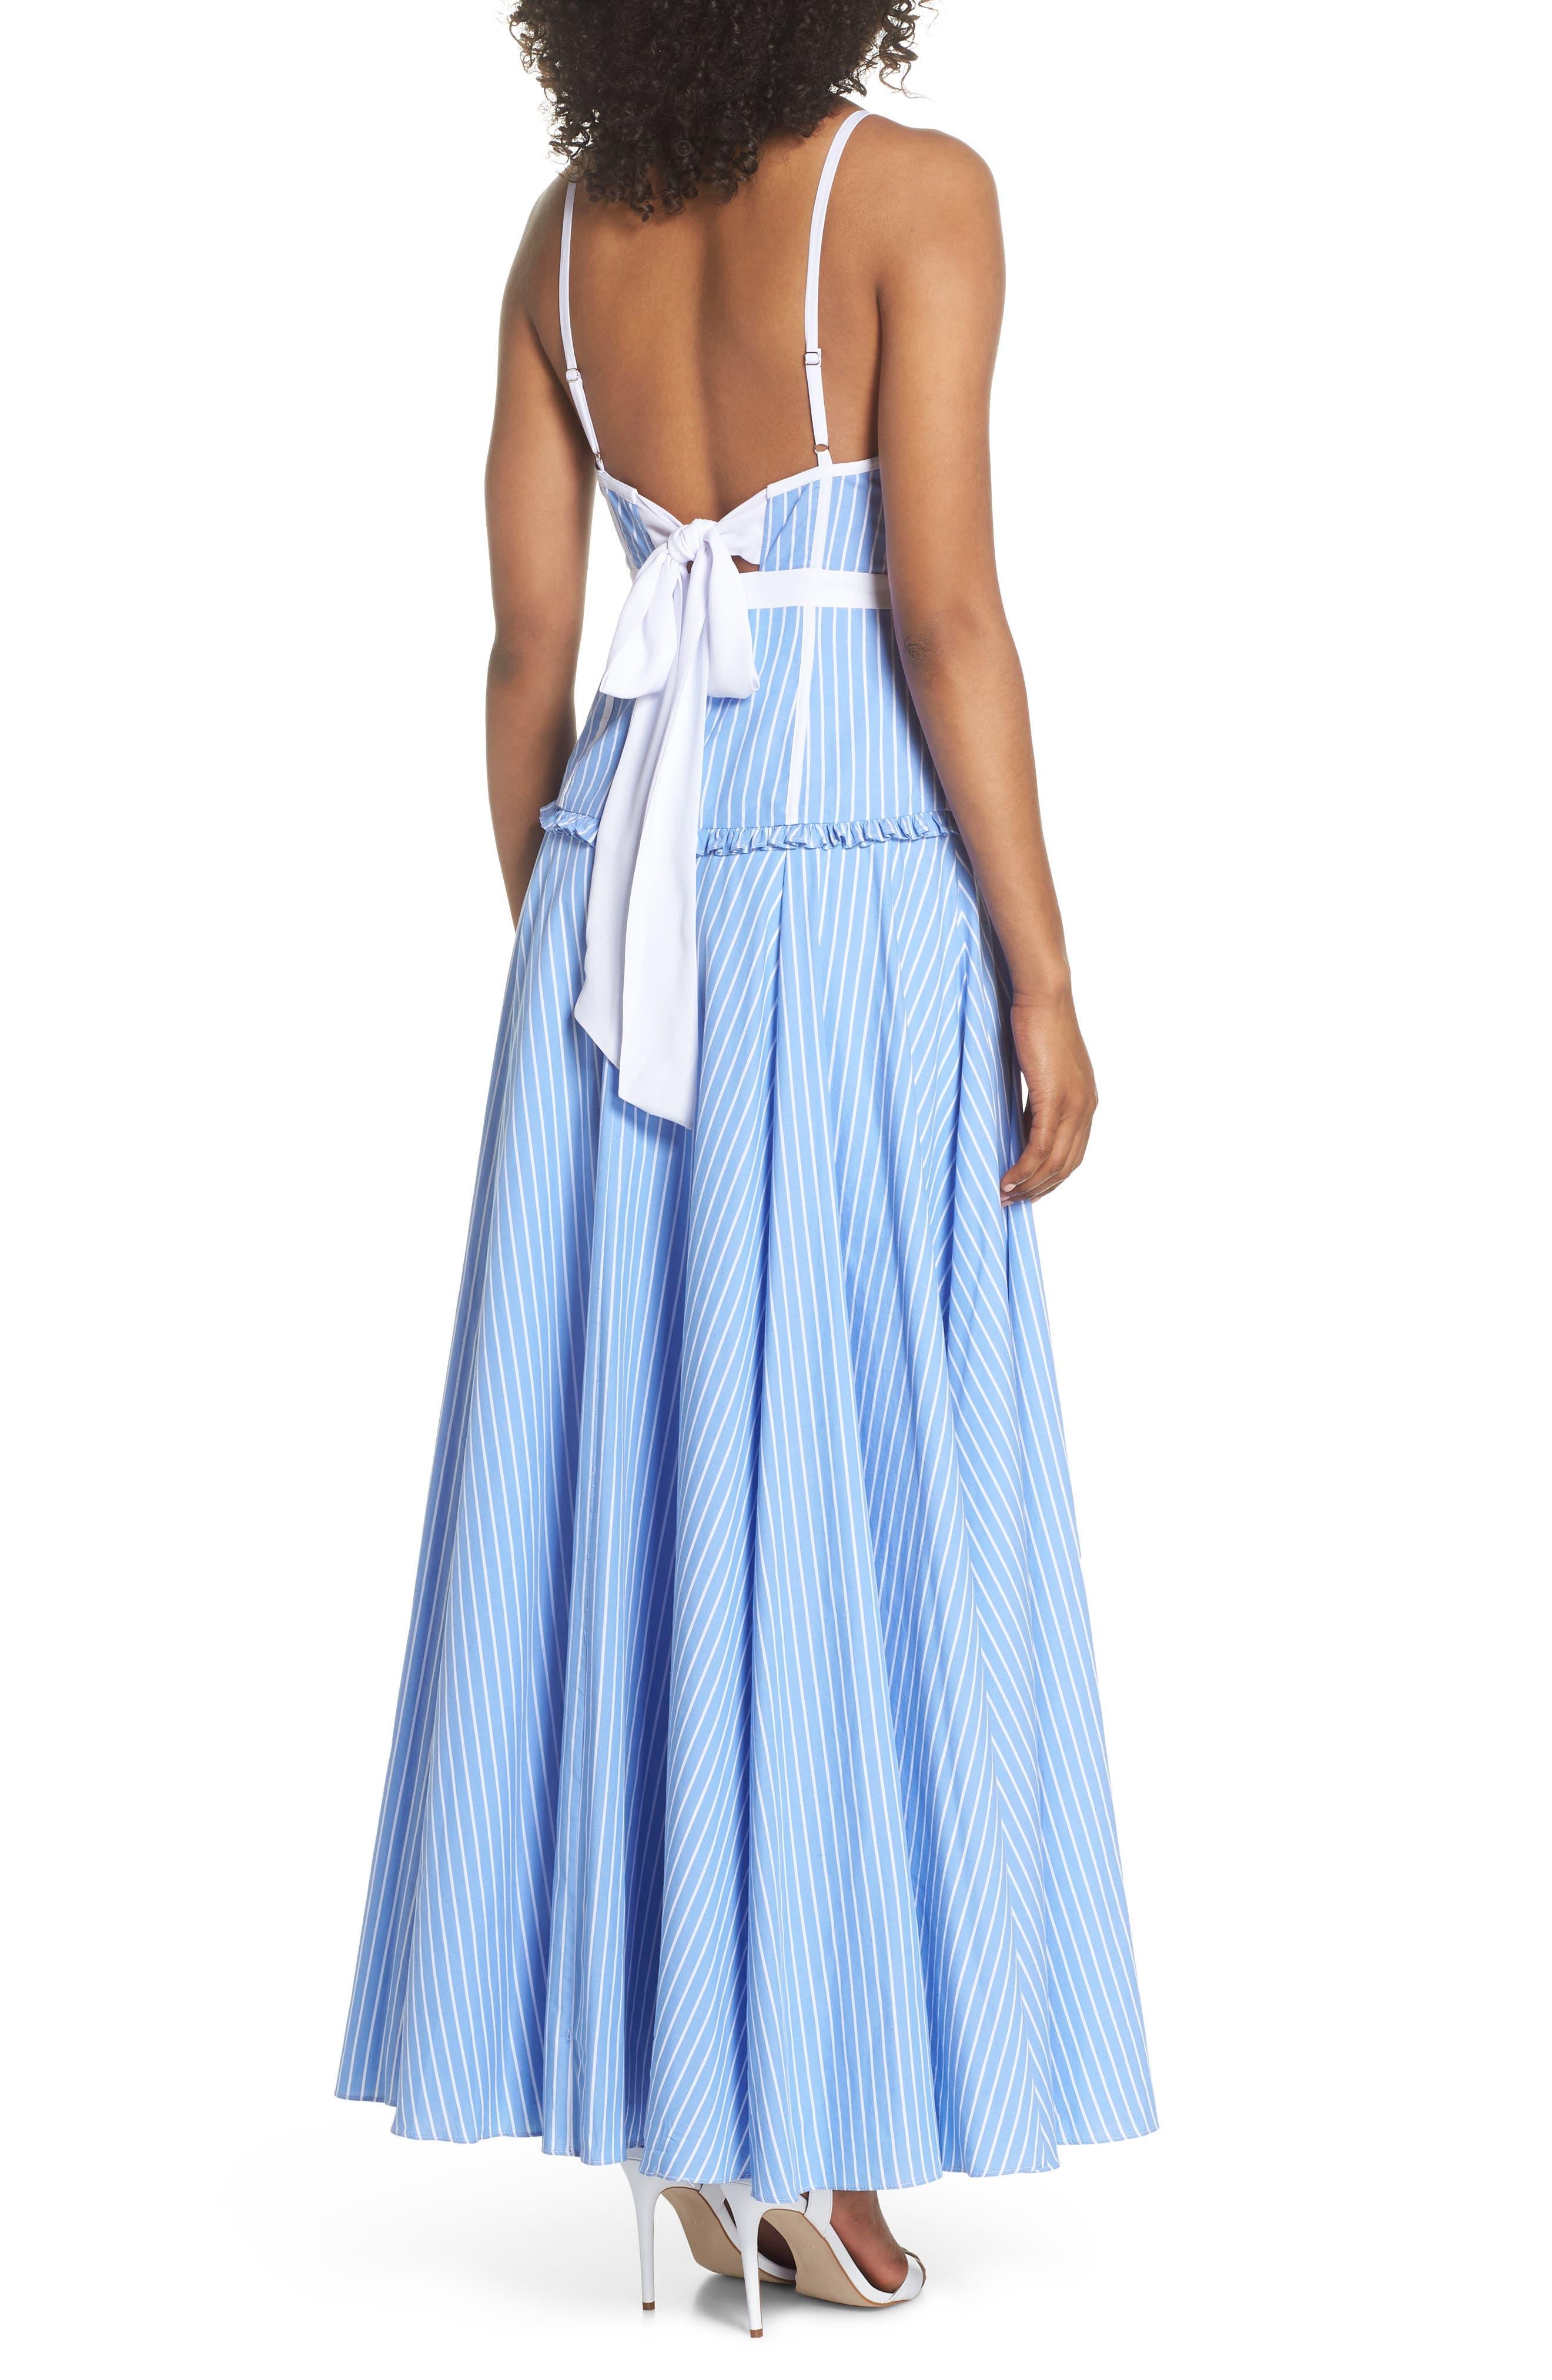 Morrow Stripe Corset Gown,                             Alternate thumbnail 2, color,                             Pale Blue/ White Stripe